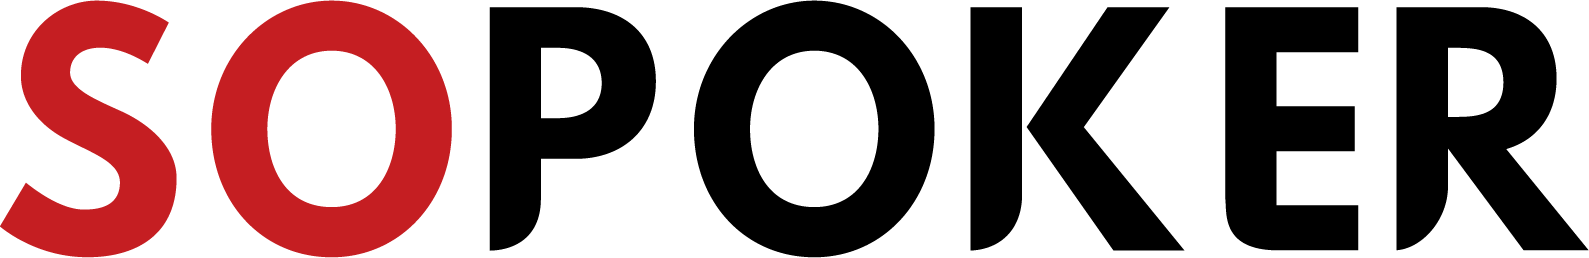 SoPoker